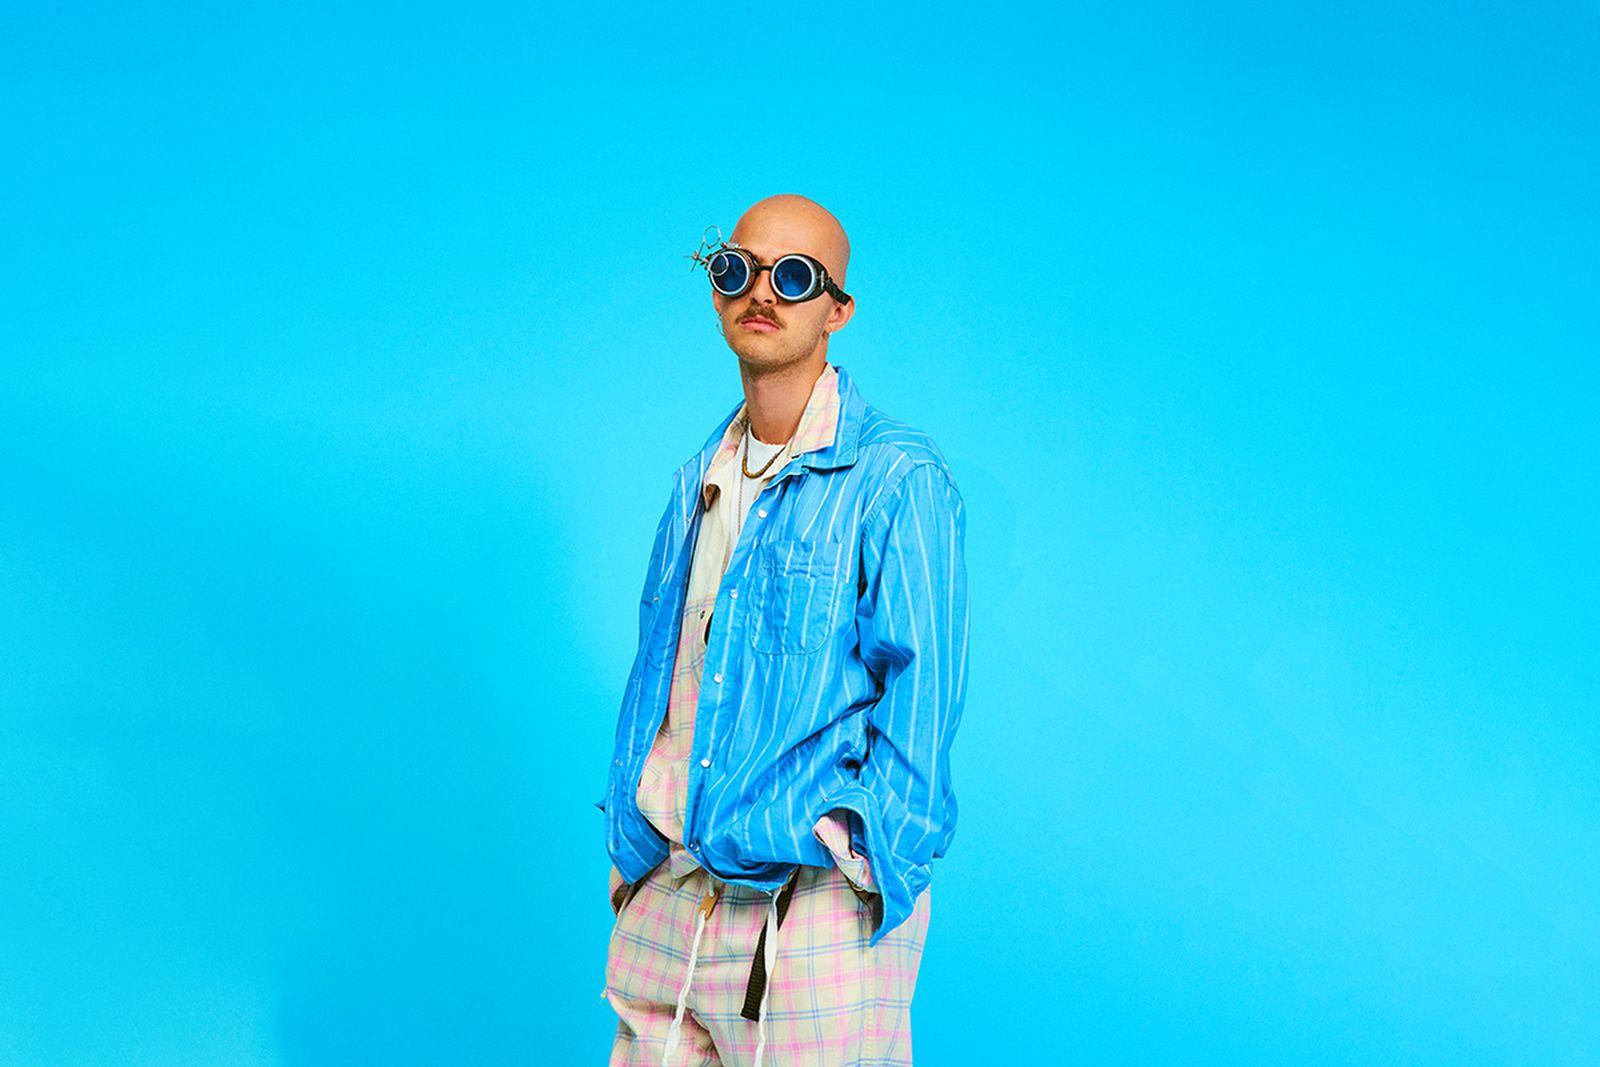 AiE SS20 sunglasses blue background